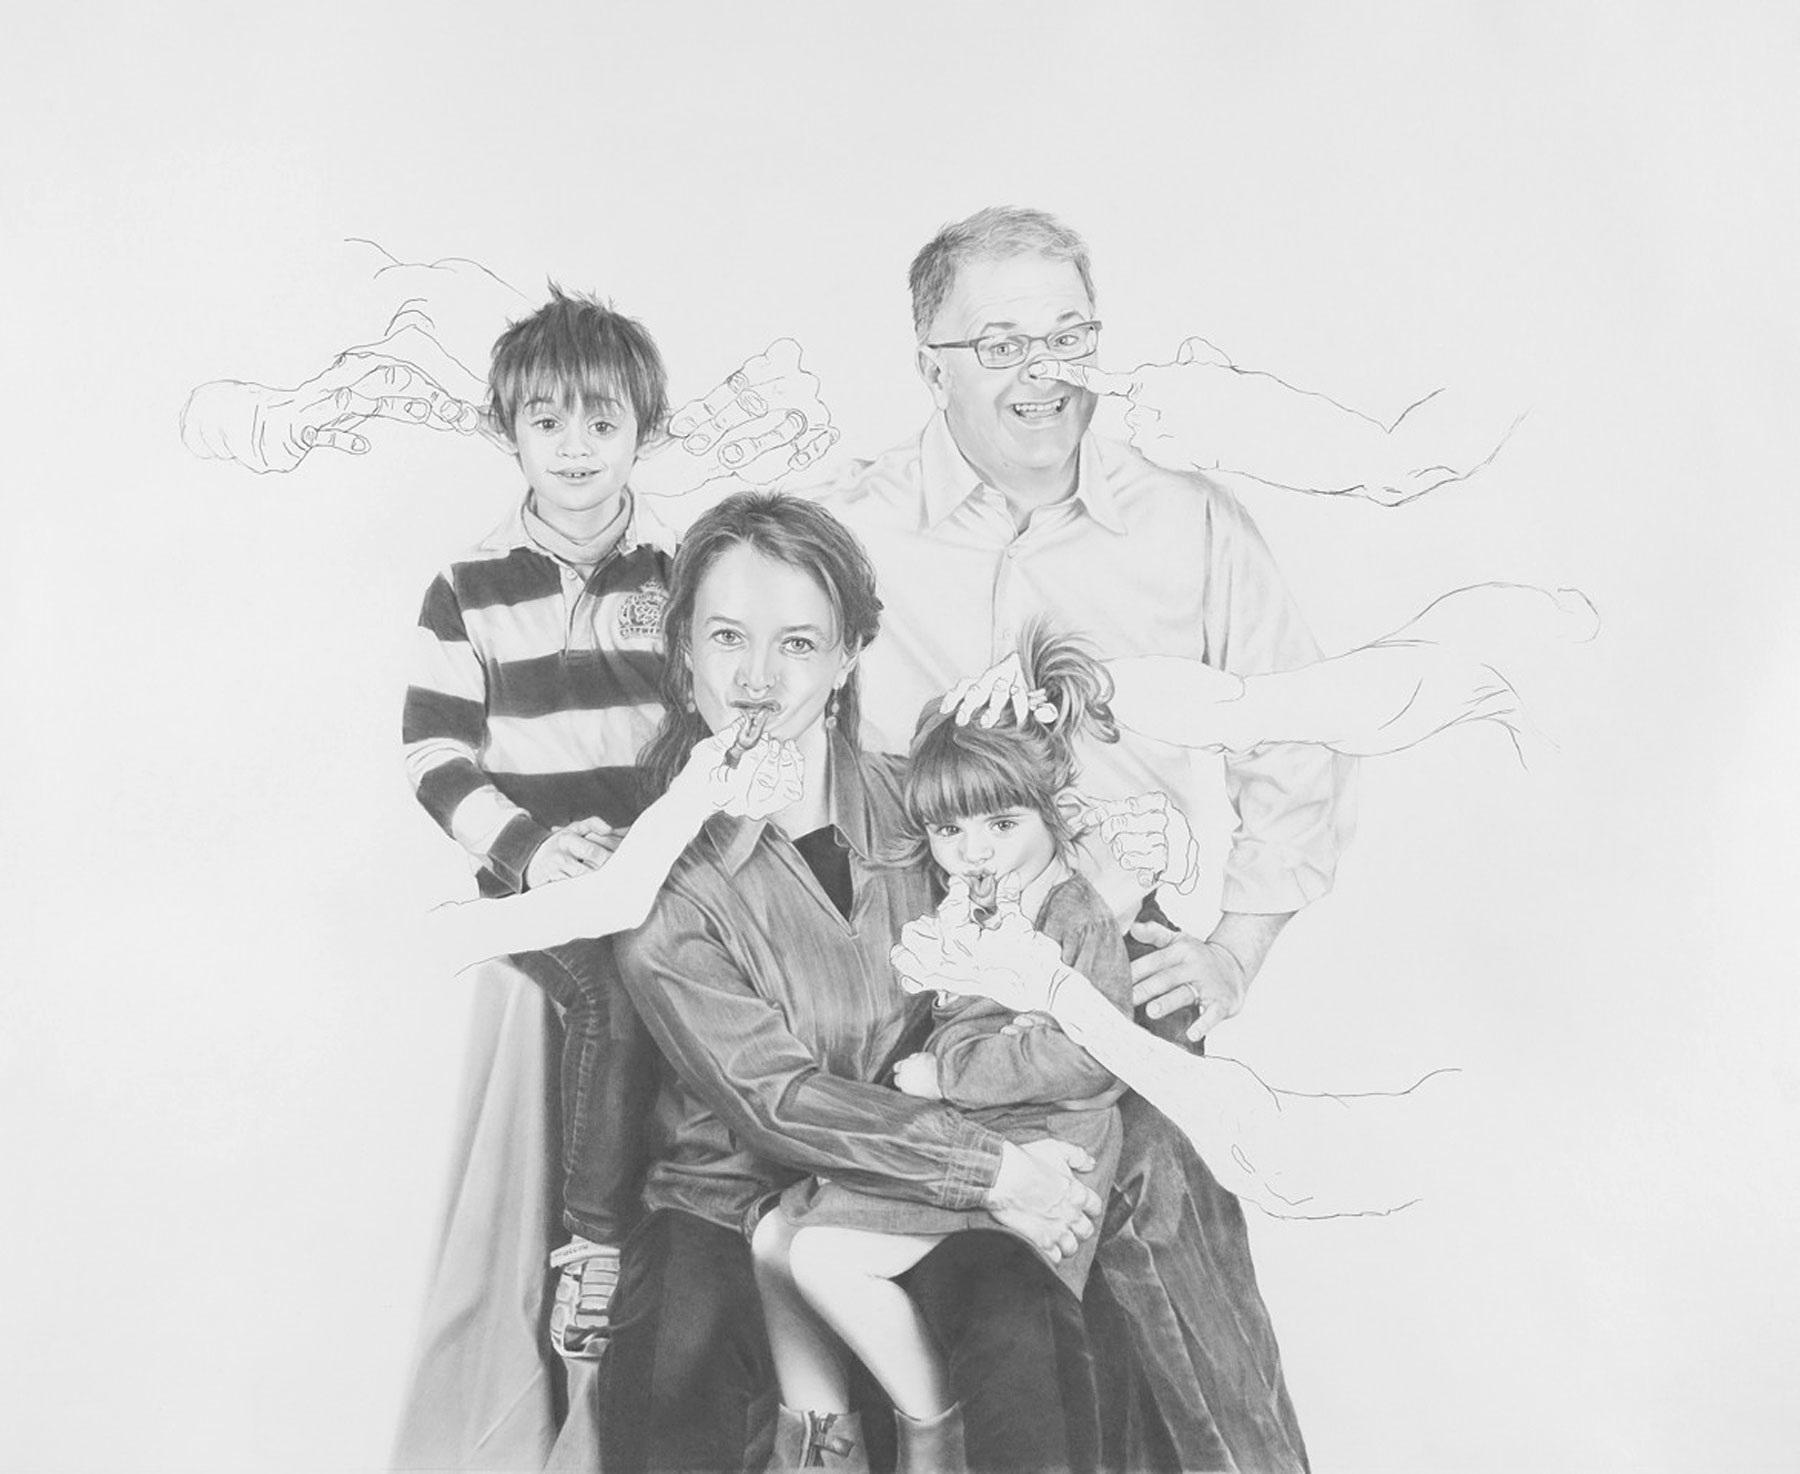 Cook_Colin_Family-Portrait_2015_01